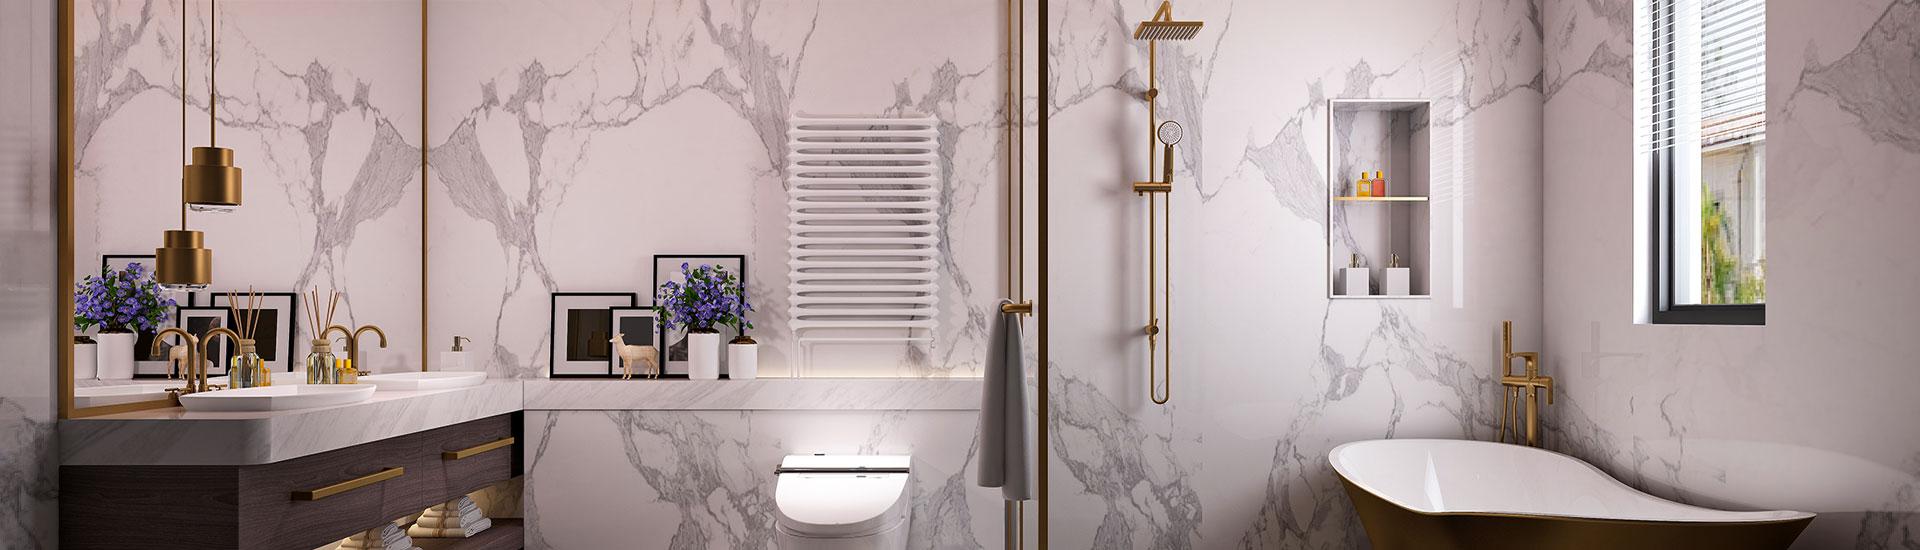 Bathroom Renovation in Fort Lauderdale, Davie, Pembroke ...